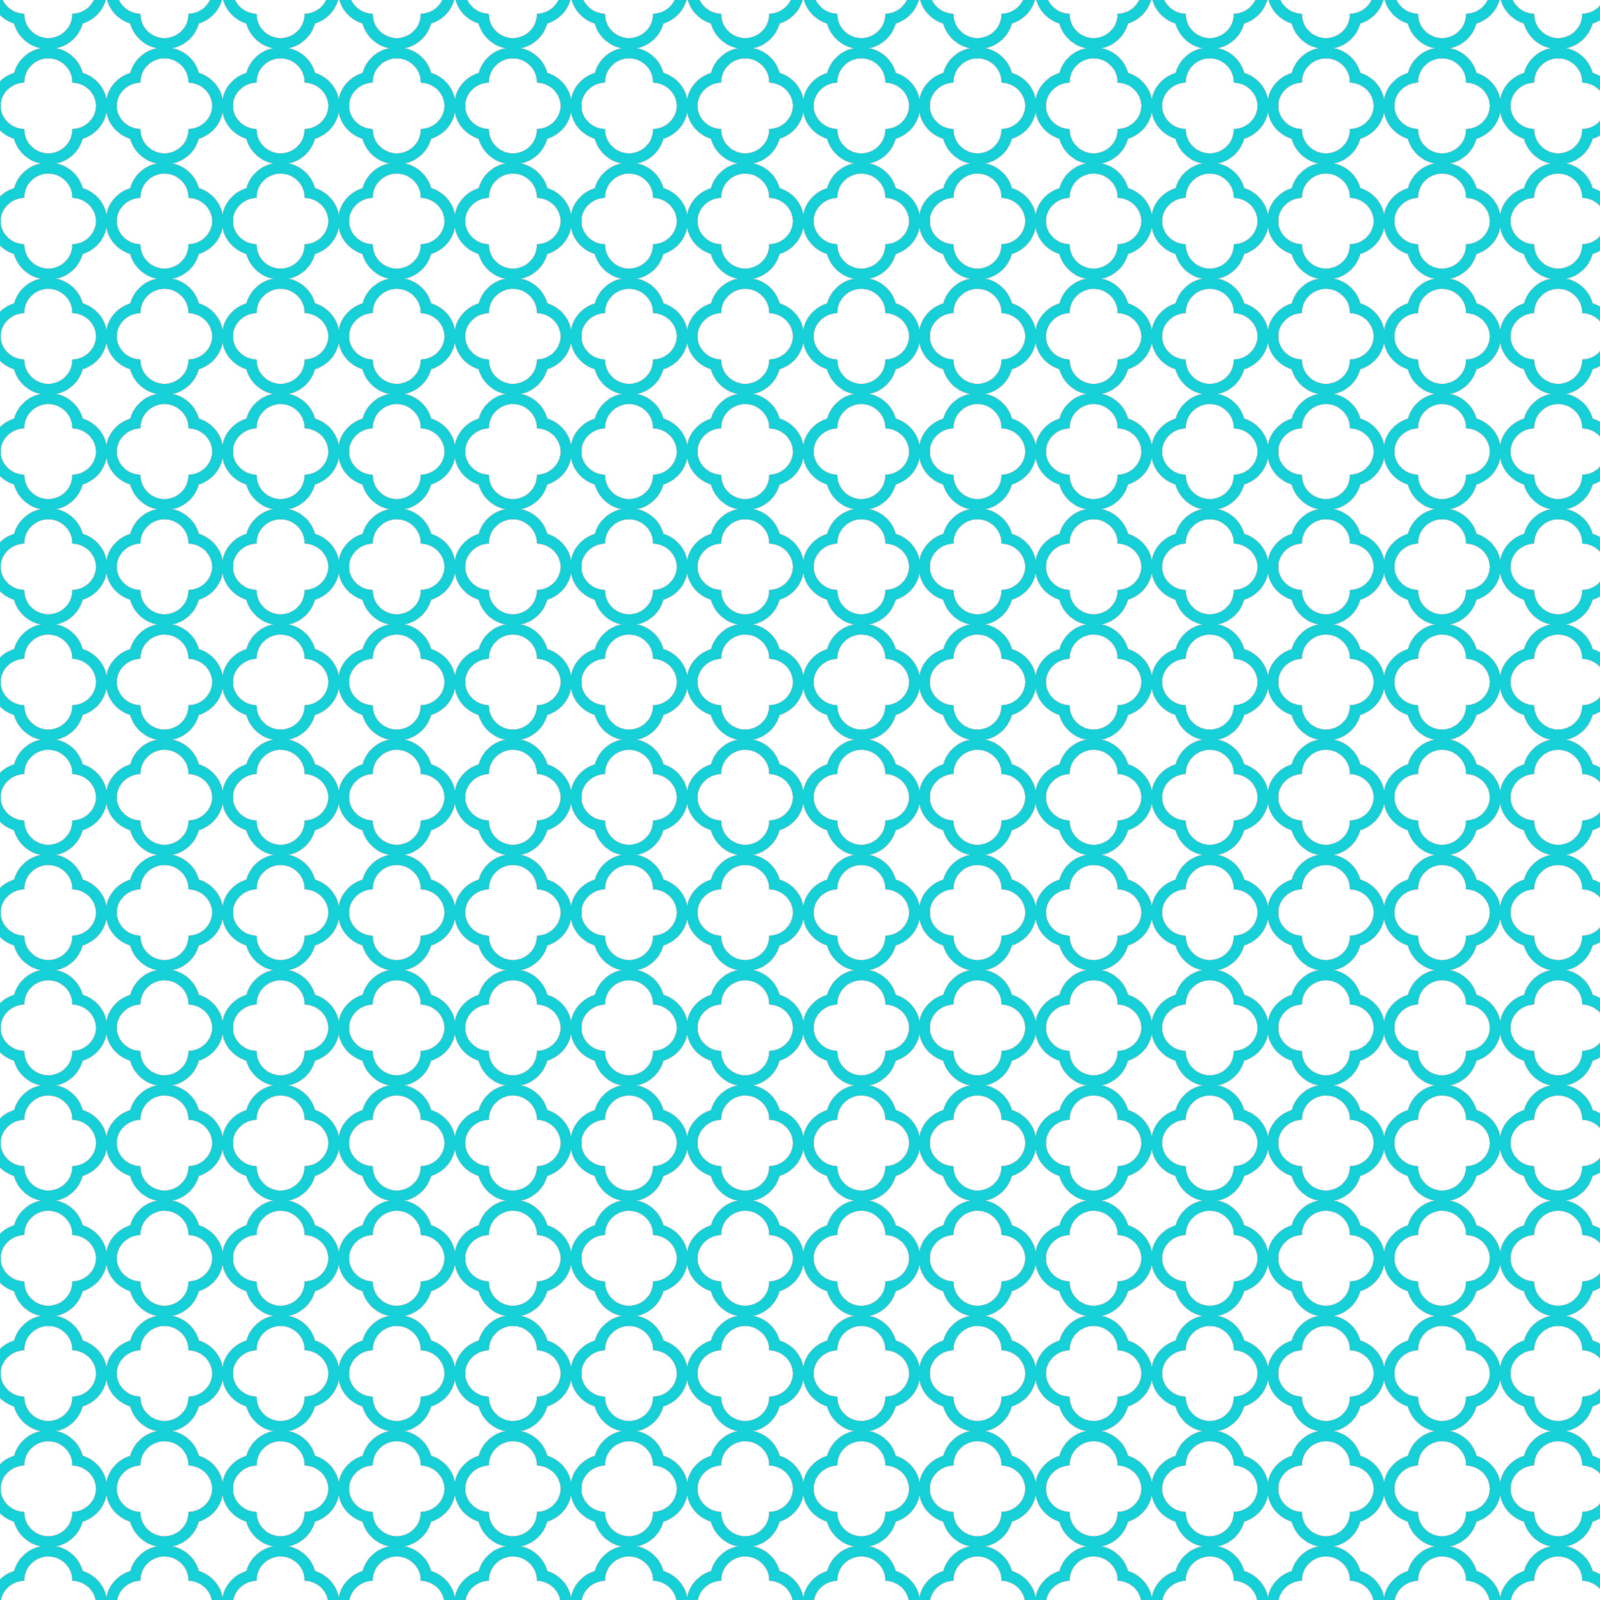 More Free Printable Patterns! - Free Printable Moroccan Pattern